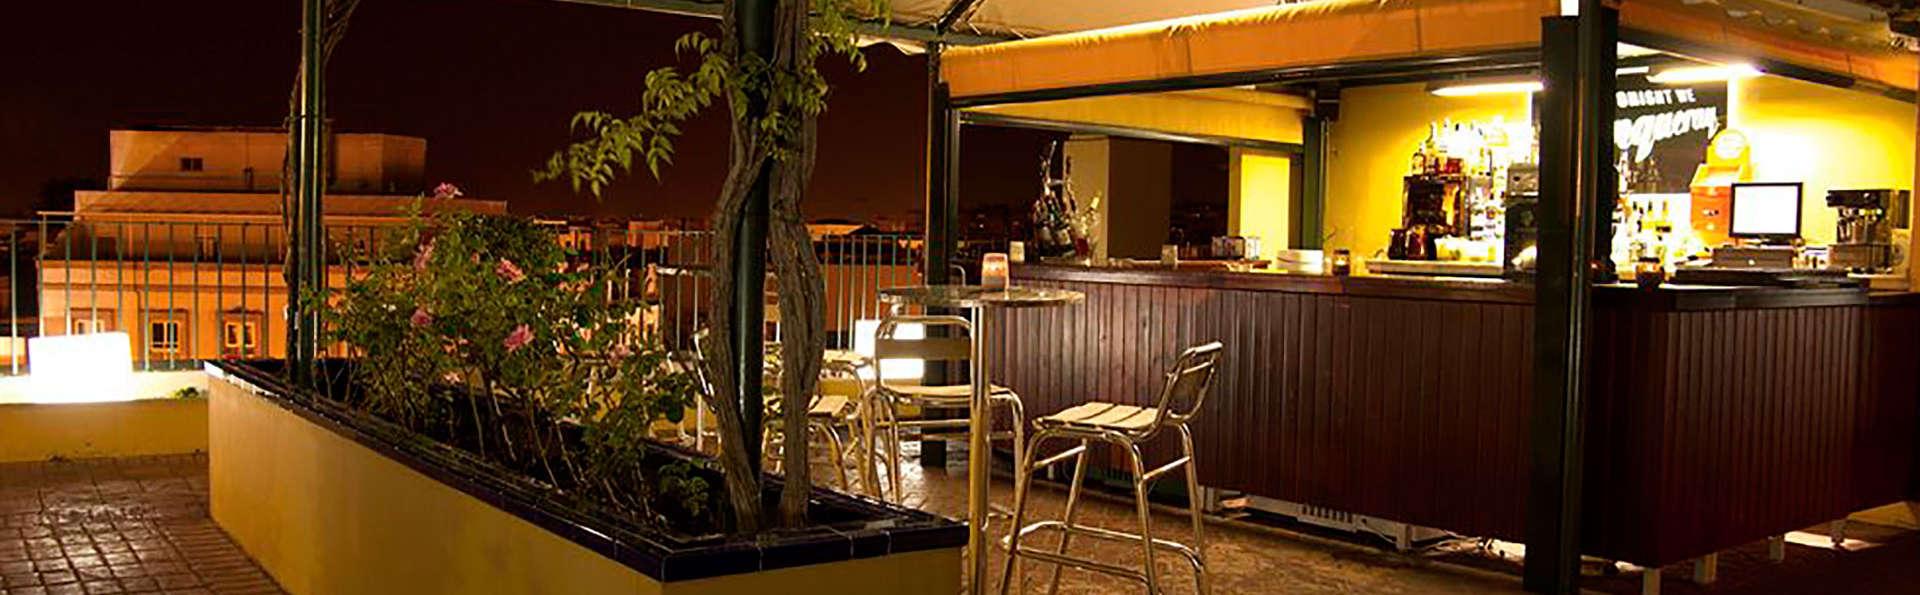 Hotel Don Paco - EDIT_terrace.jpg